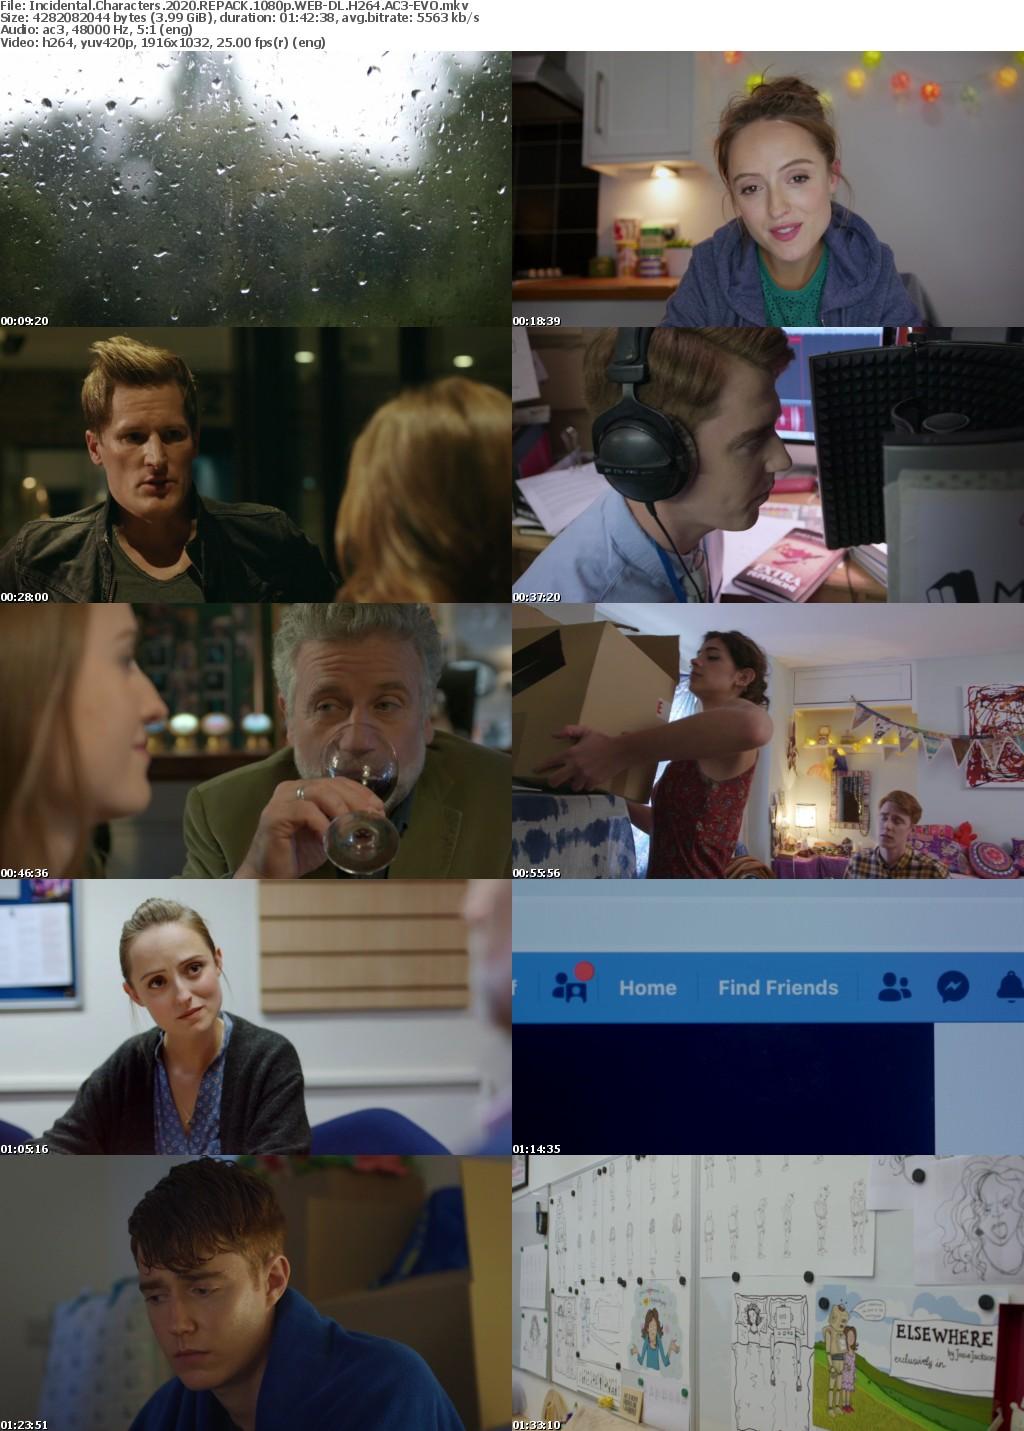 Incidental Characters (2020) REPACK 1080p WEB-DL H264 AC3-EVO